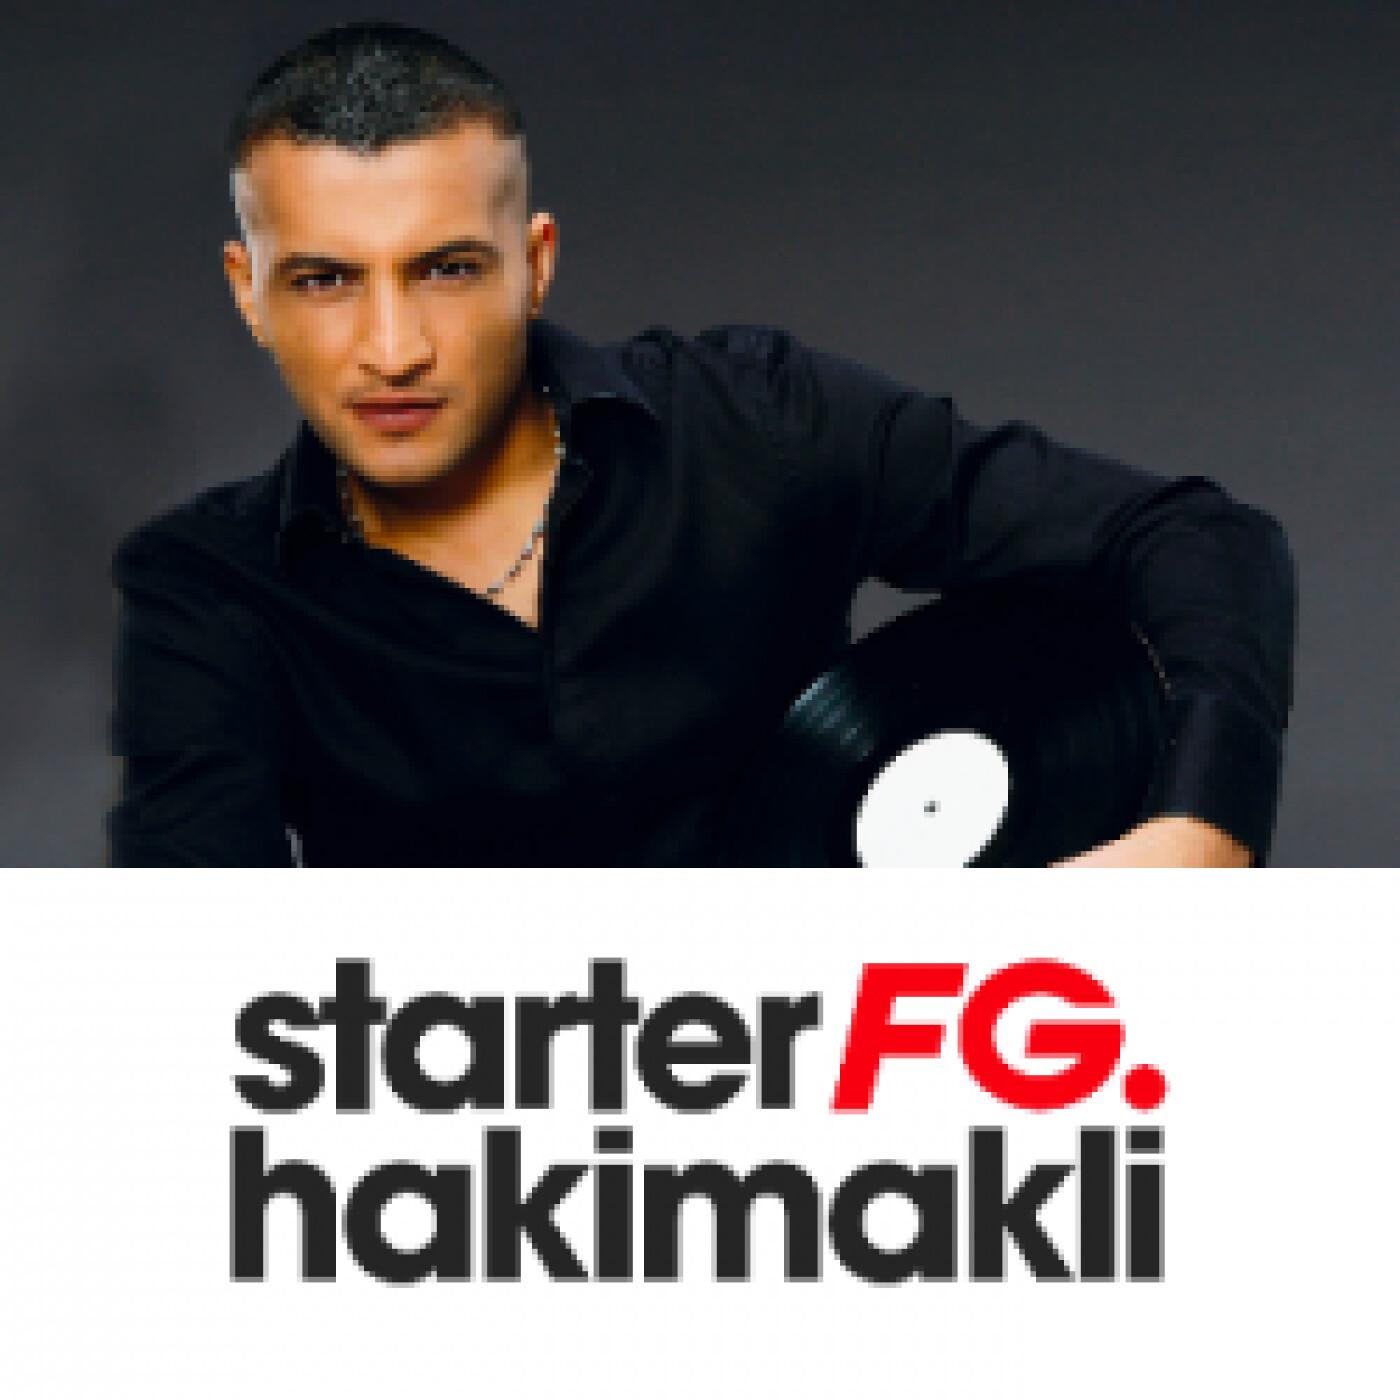 STARTER FG BY HAKIMAKLI MERCREDI 26 MAI 2021